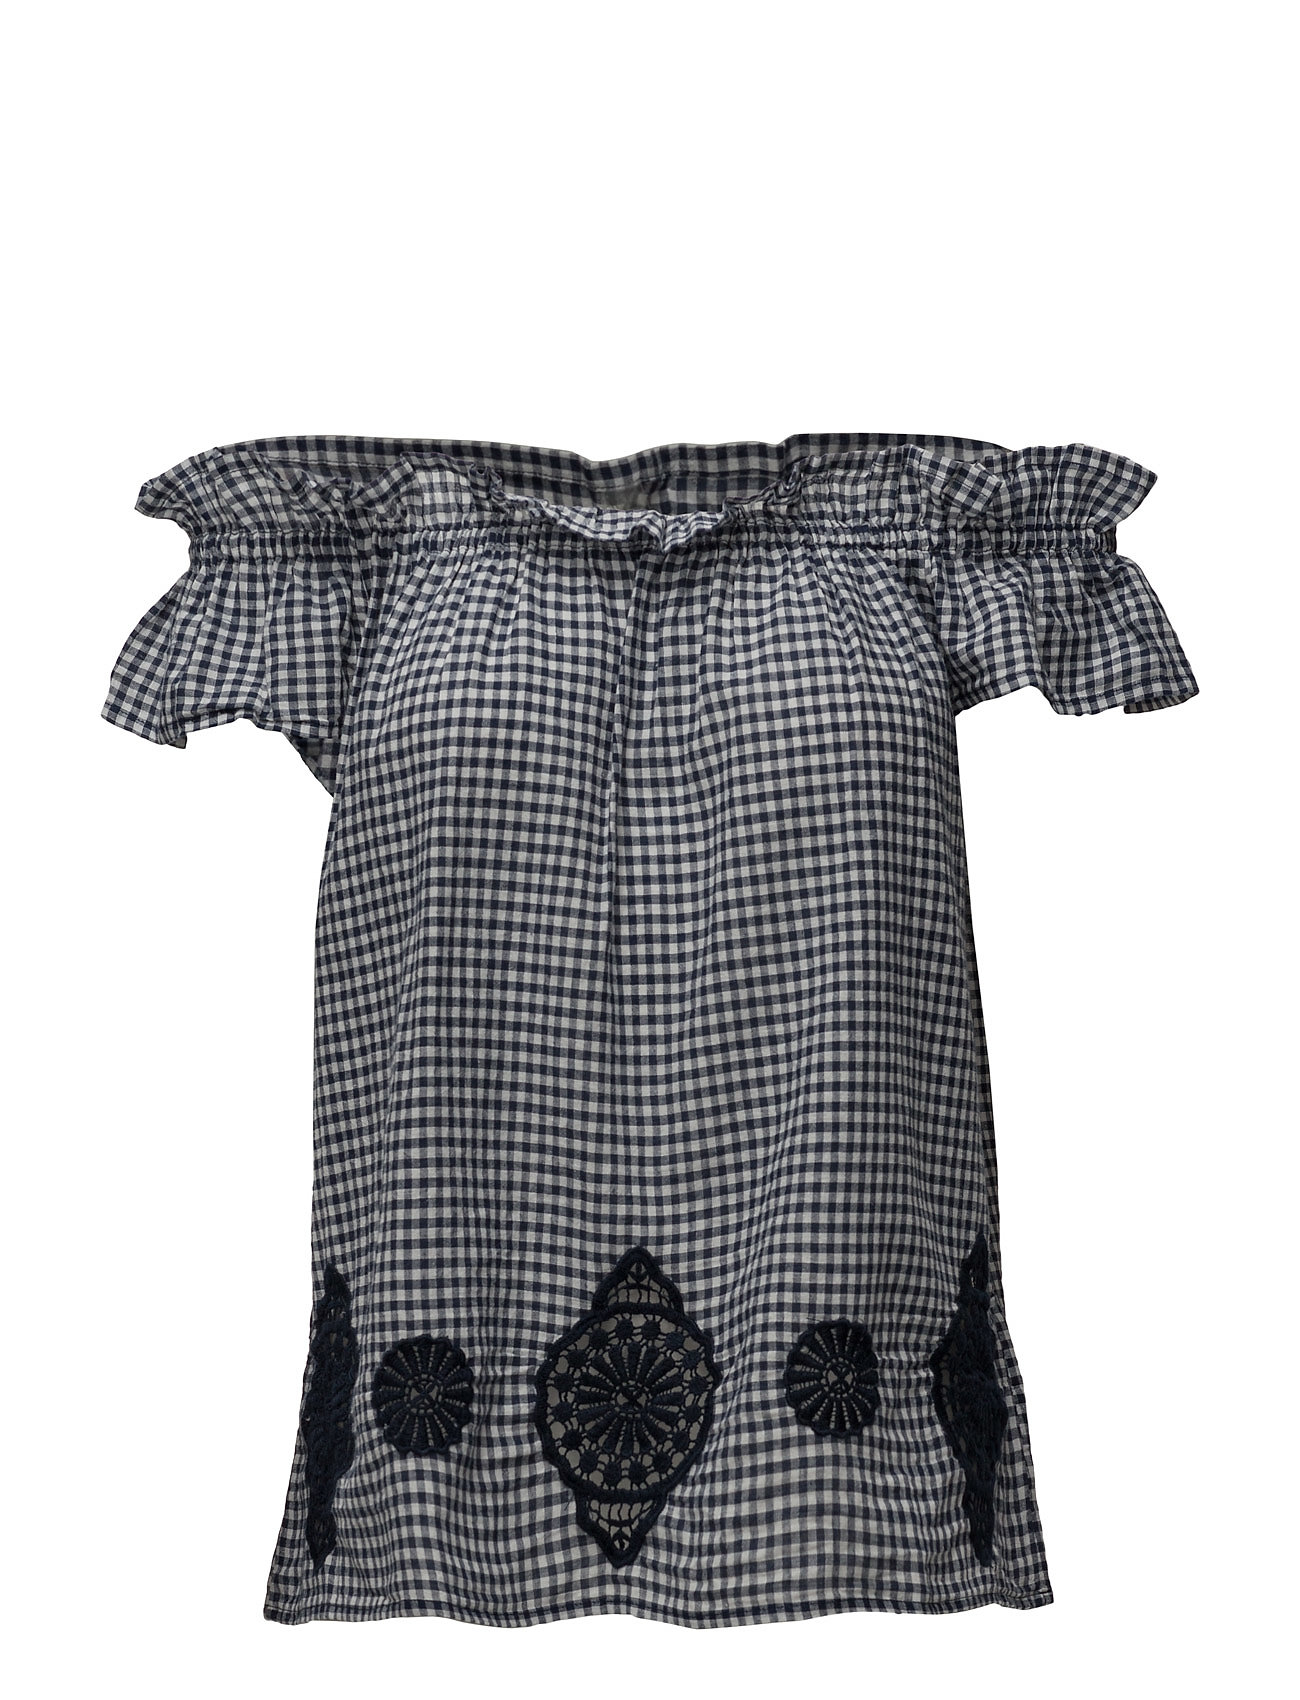 Blouses Woven EDC by Esprit Bluser til Kvinder i Off White